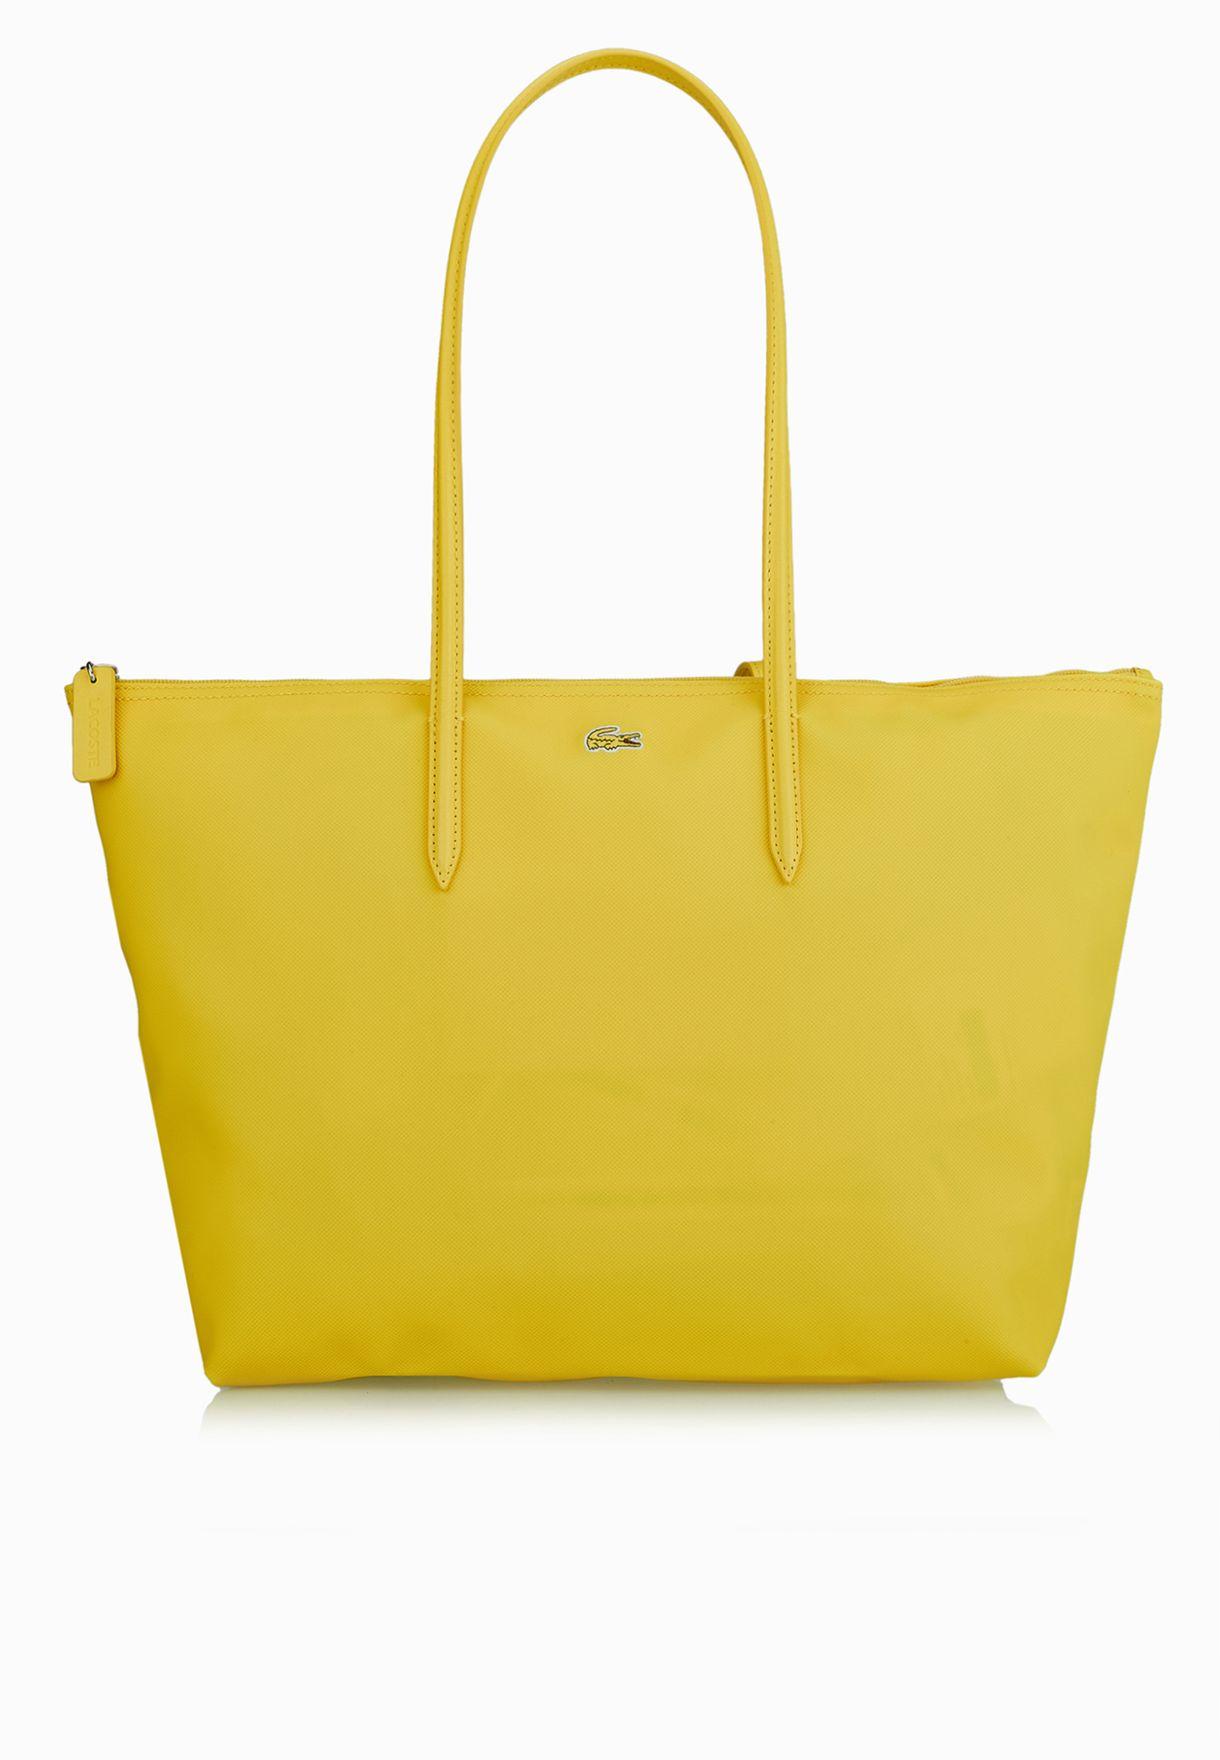 fafc2d10dfa9f3 Shop Lacoste yellow L1 Large Shopper NF1344PO-789 for Women in Saudi -  LA014AC30HVH